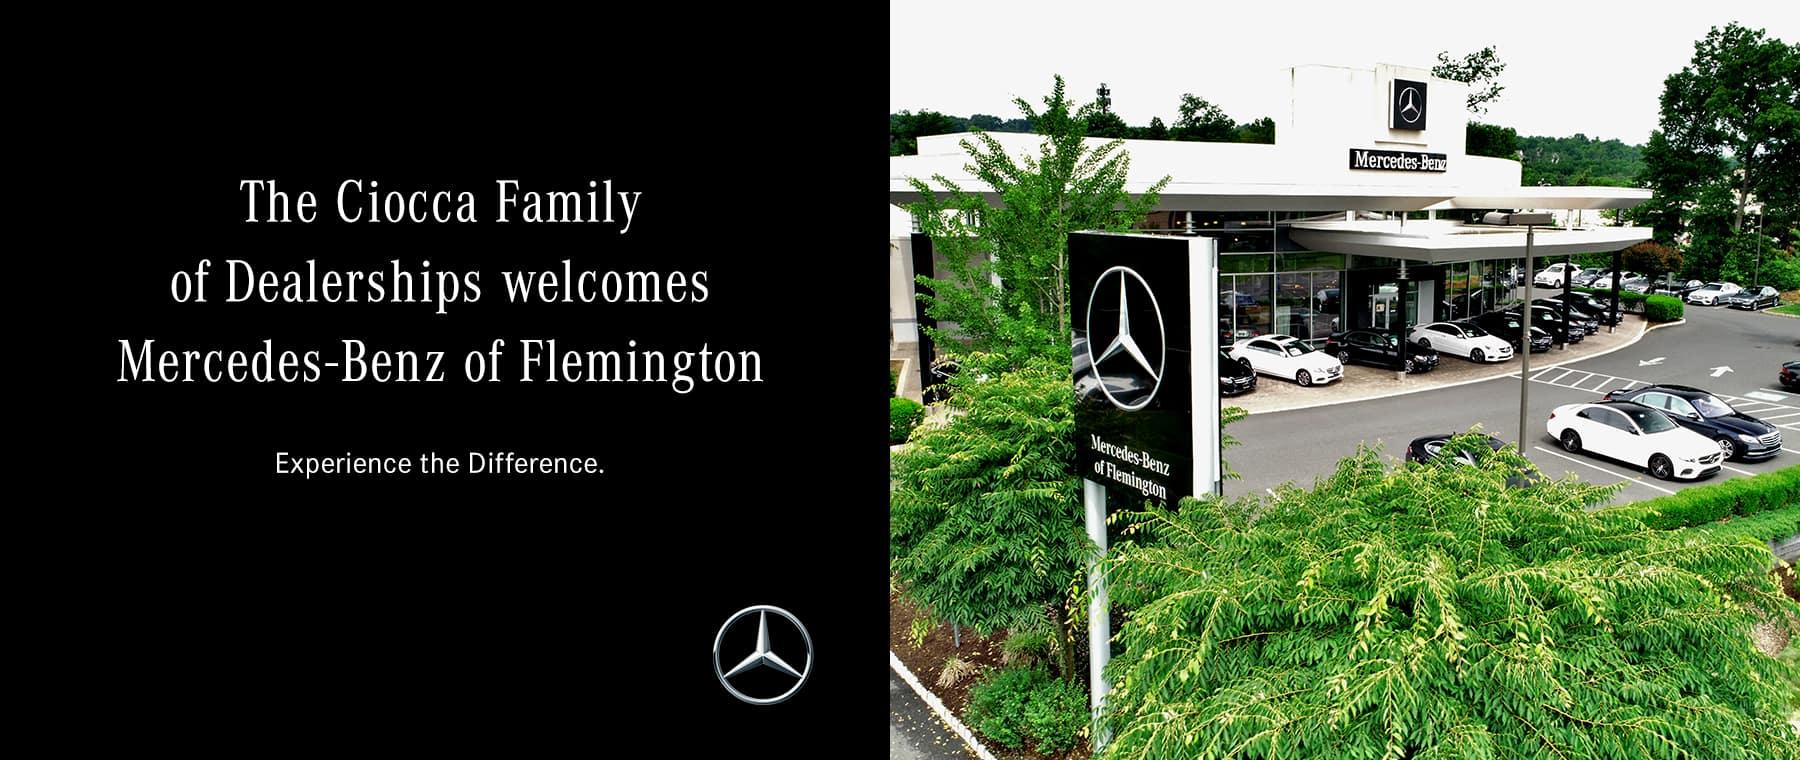 Mercedes Benz Of Flemington | New Mercedes Benz Dealership In Flemington, NJ  08822